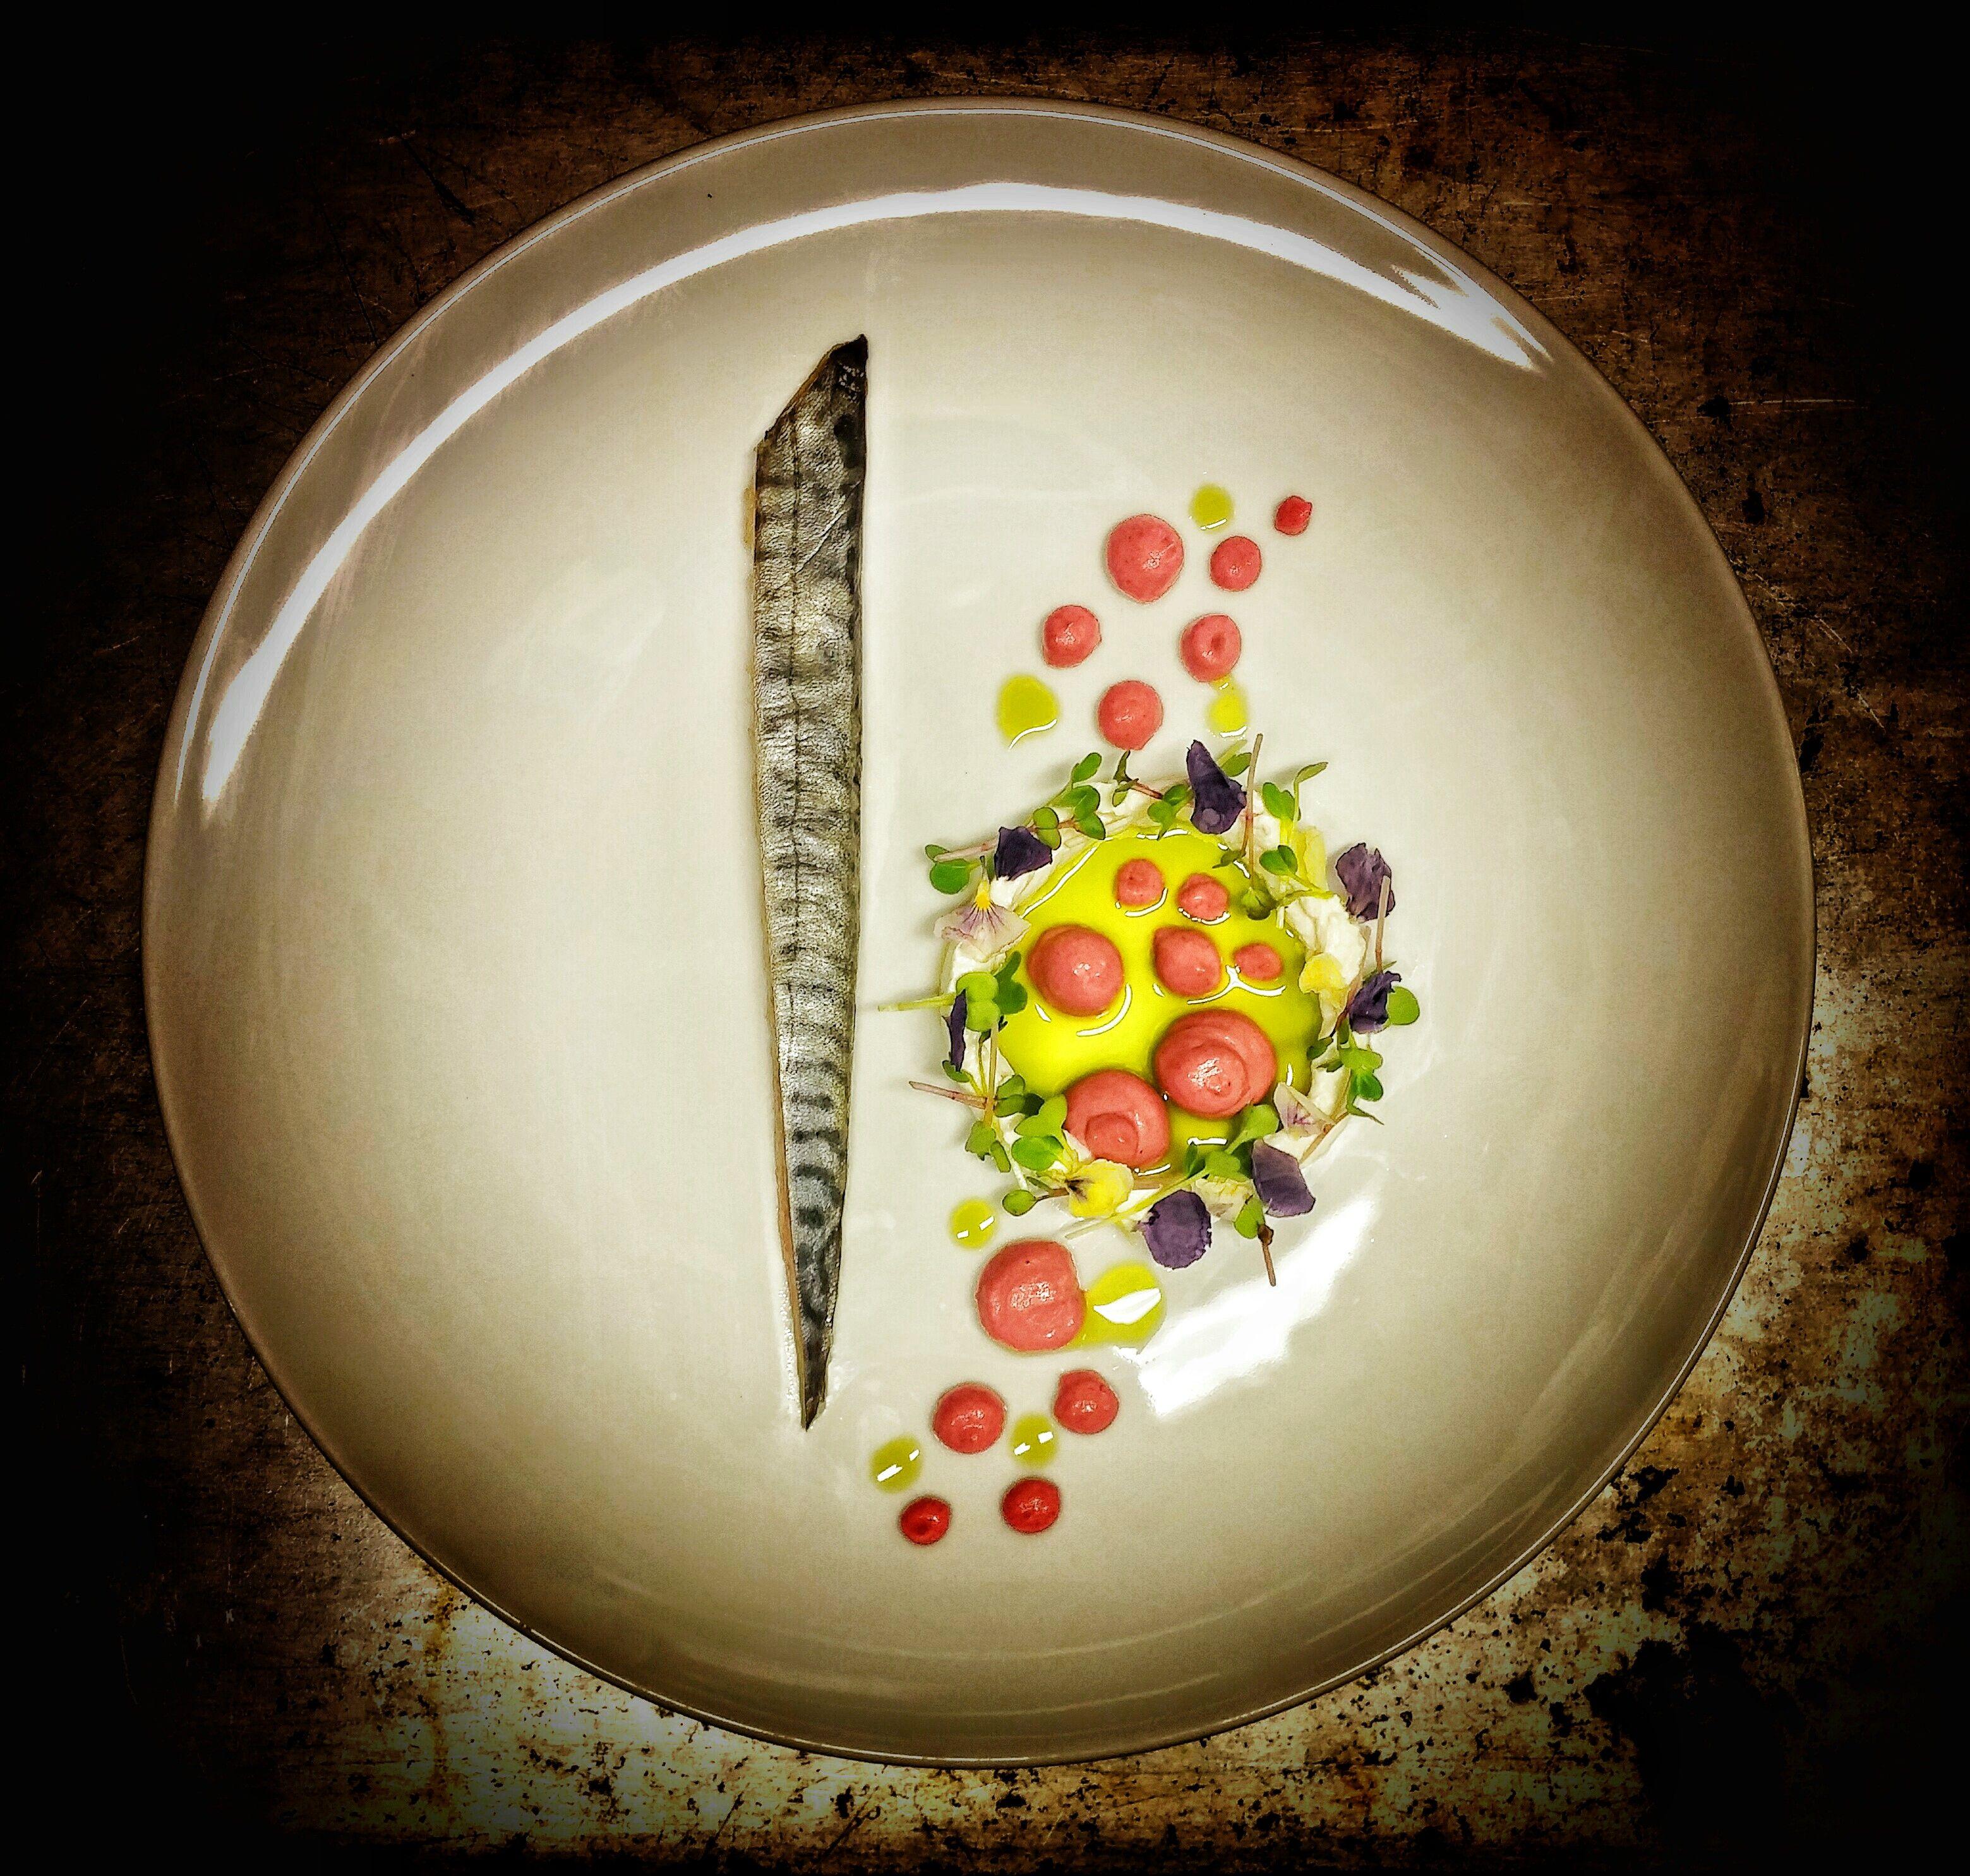 Mackerel In Vinegar | Beet Aioli | Horseradish Cream | Chive Oil